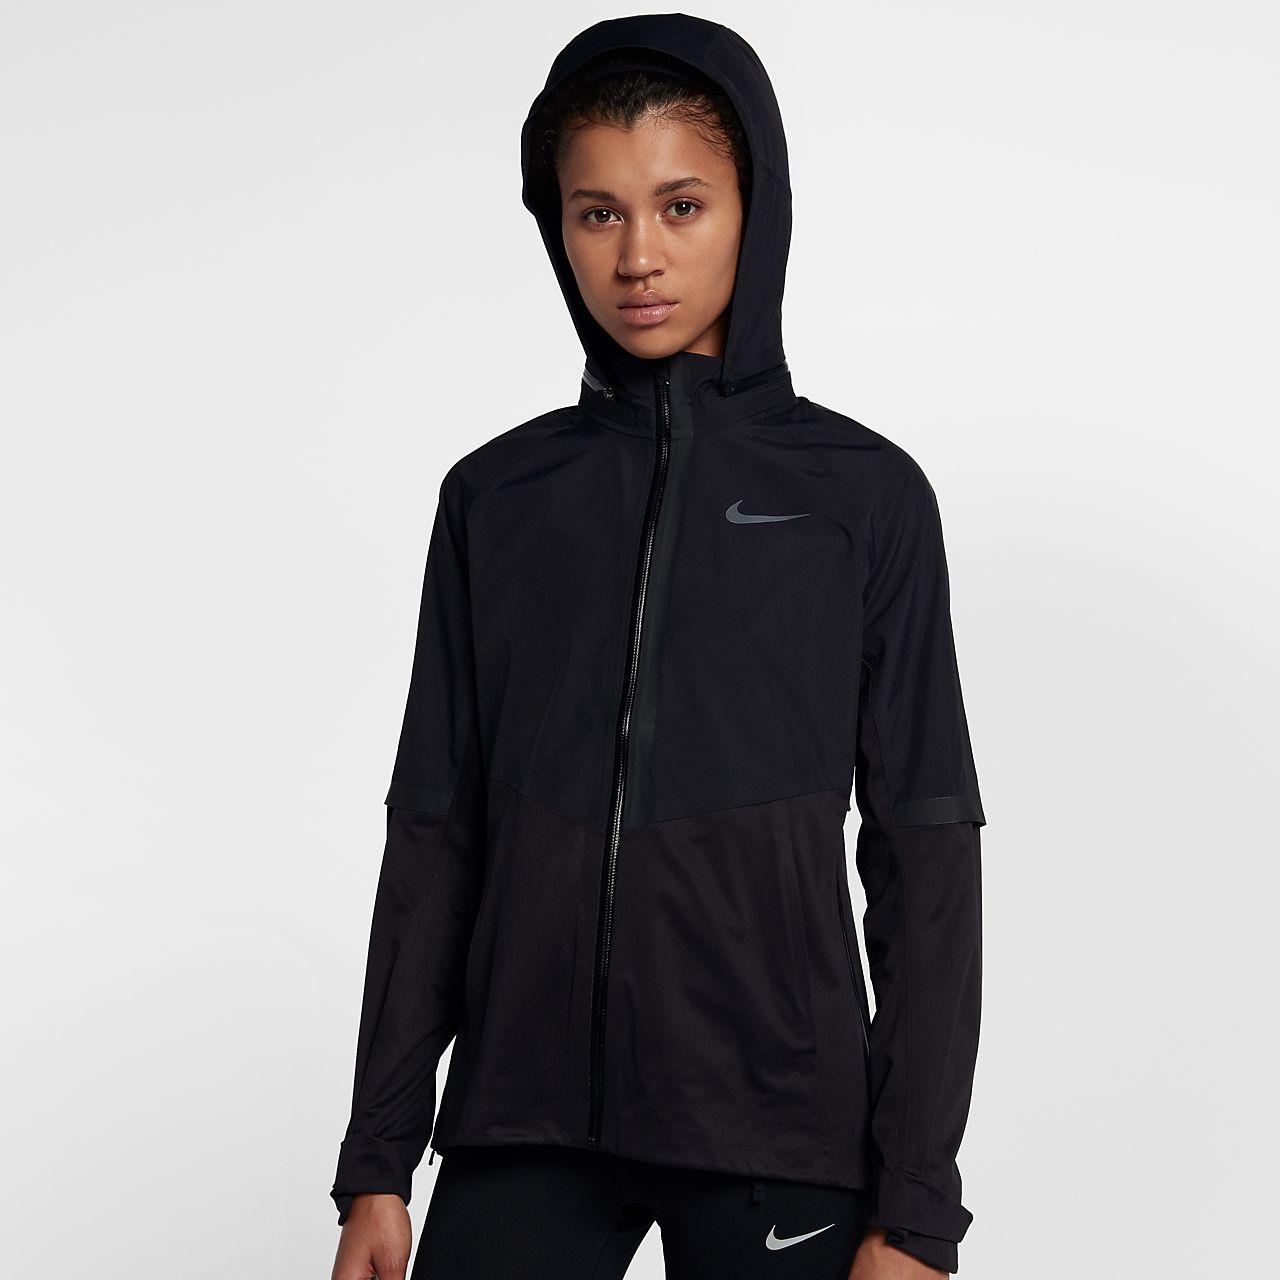 Womens black nike rain jacket